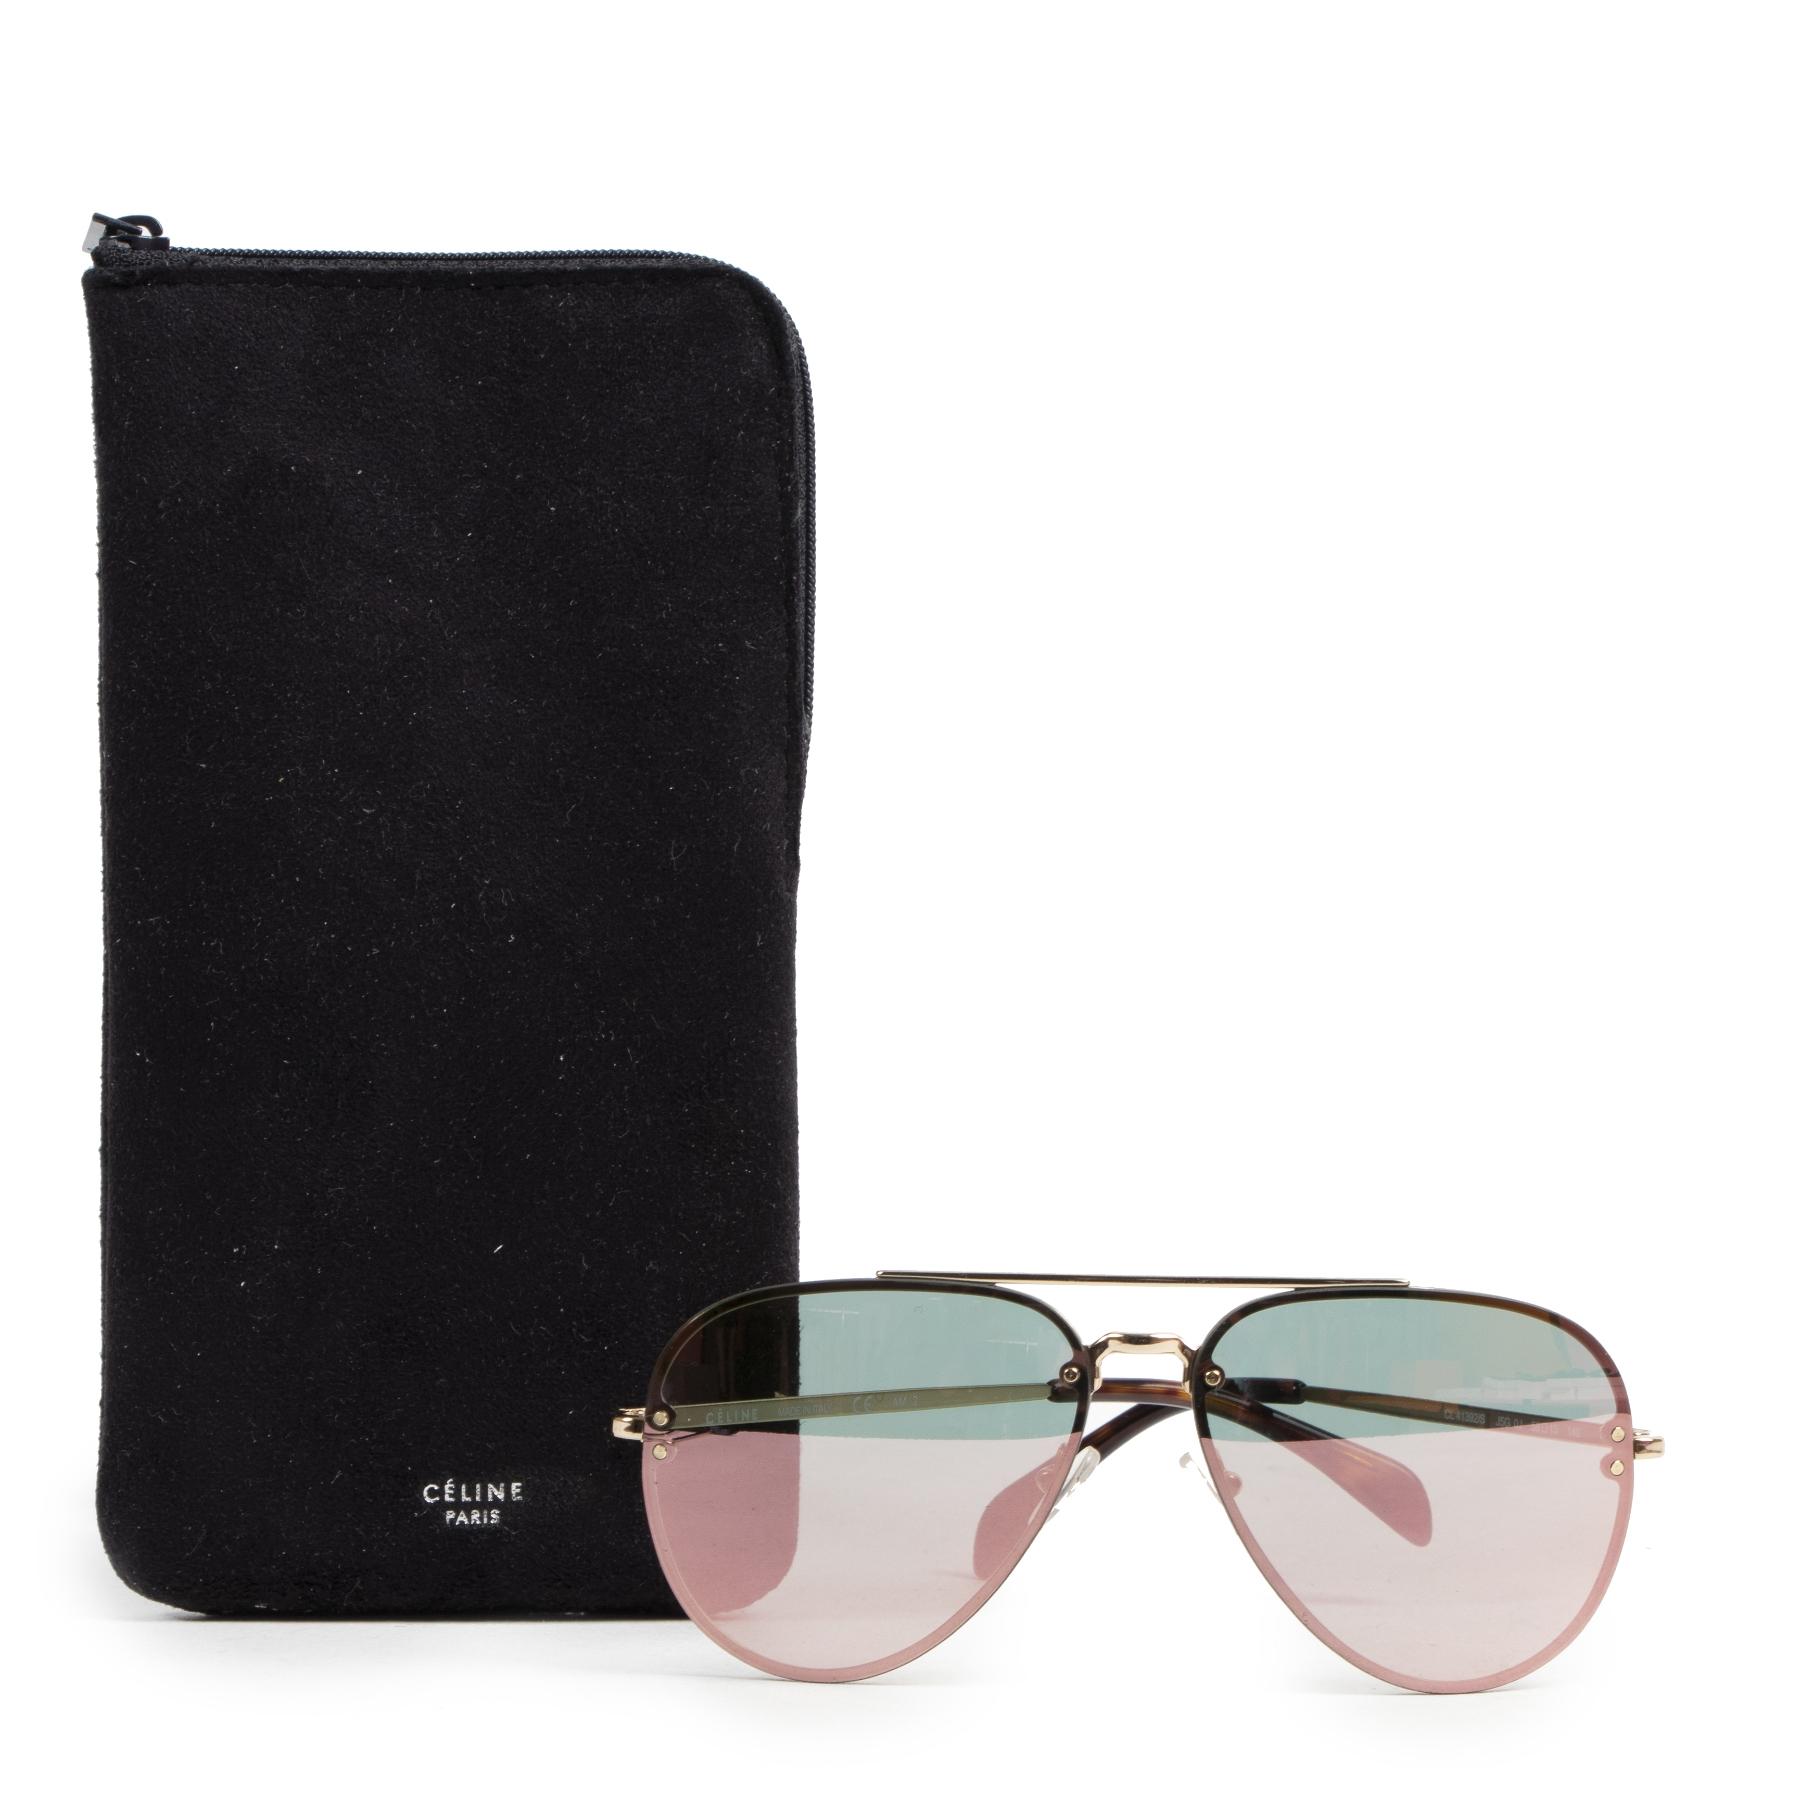 Authentic secondhand Céline Black Aviator Mirror Sunglasses designer accessories fashion luxury vintage webshop safe secure online shopping